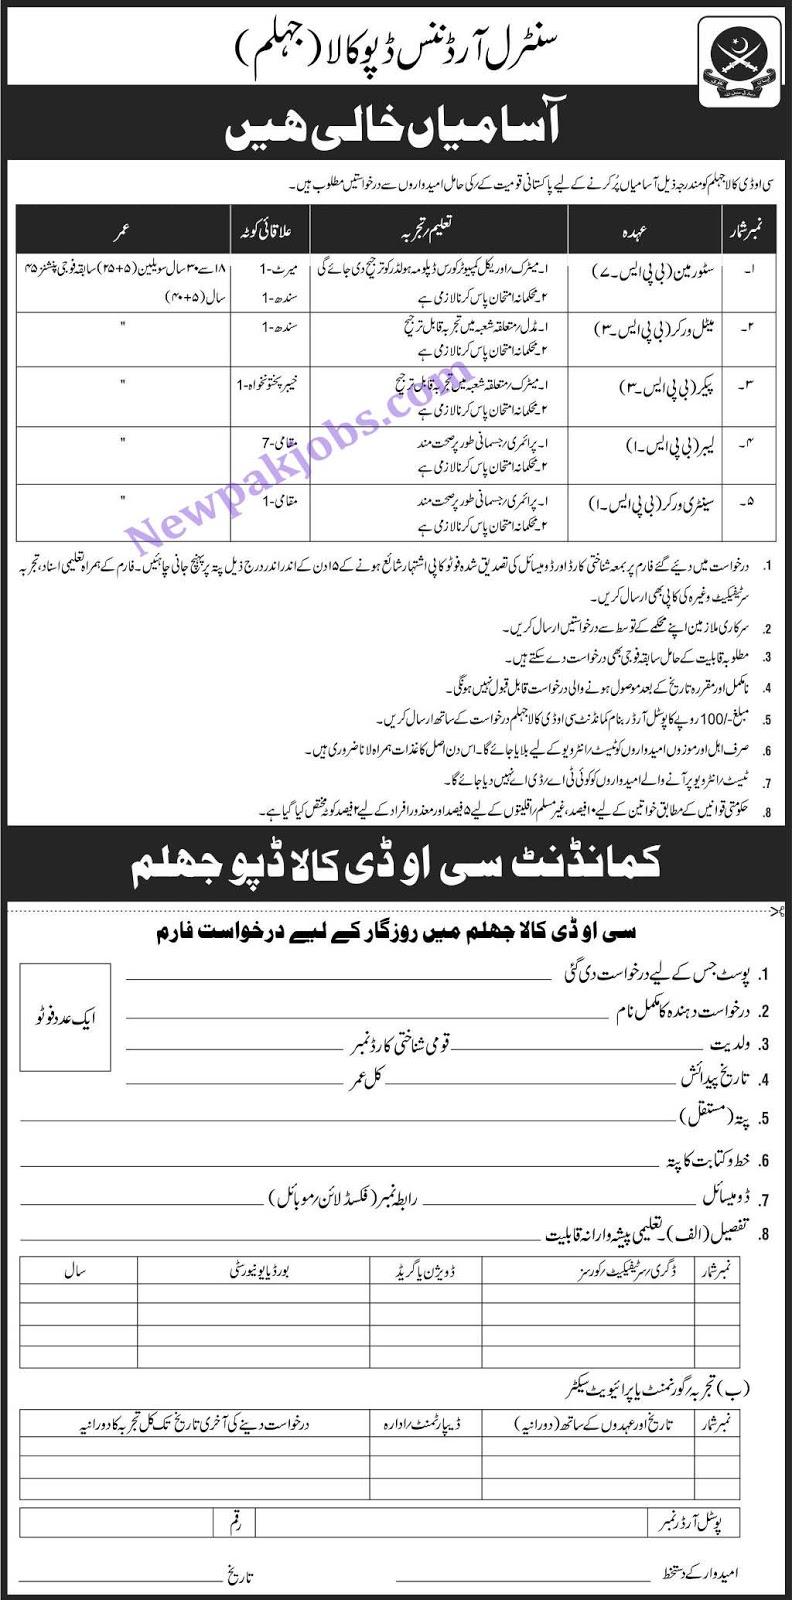 Army Jobs Nov 2018 |  Vacancies in Central Depot Kala Jhelum